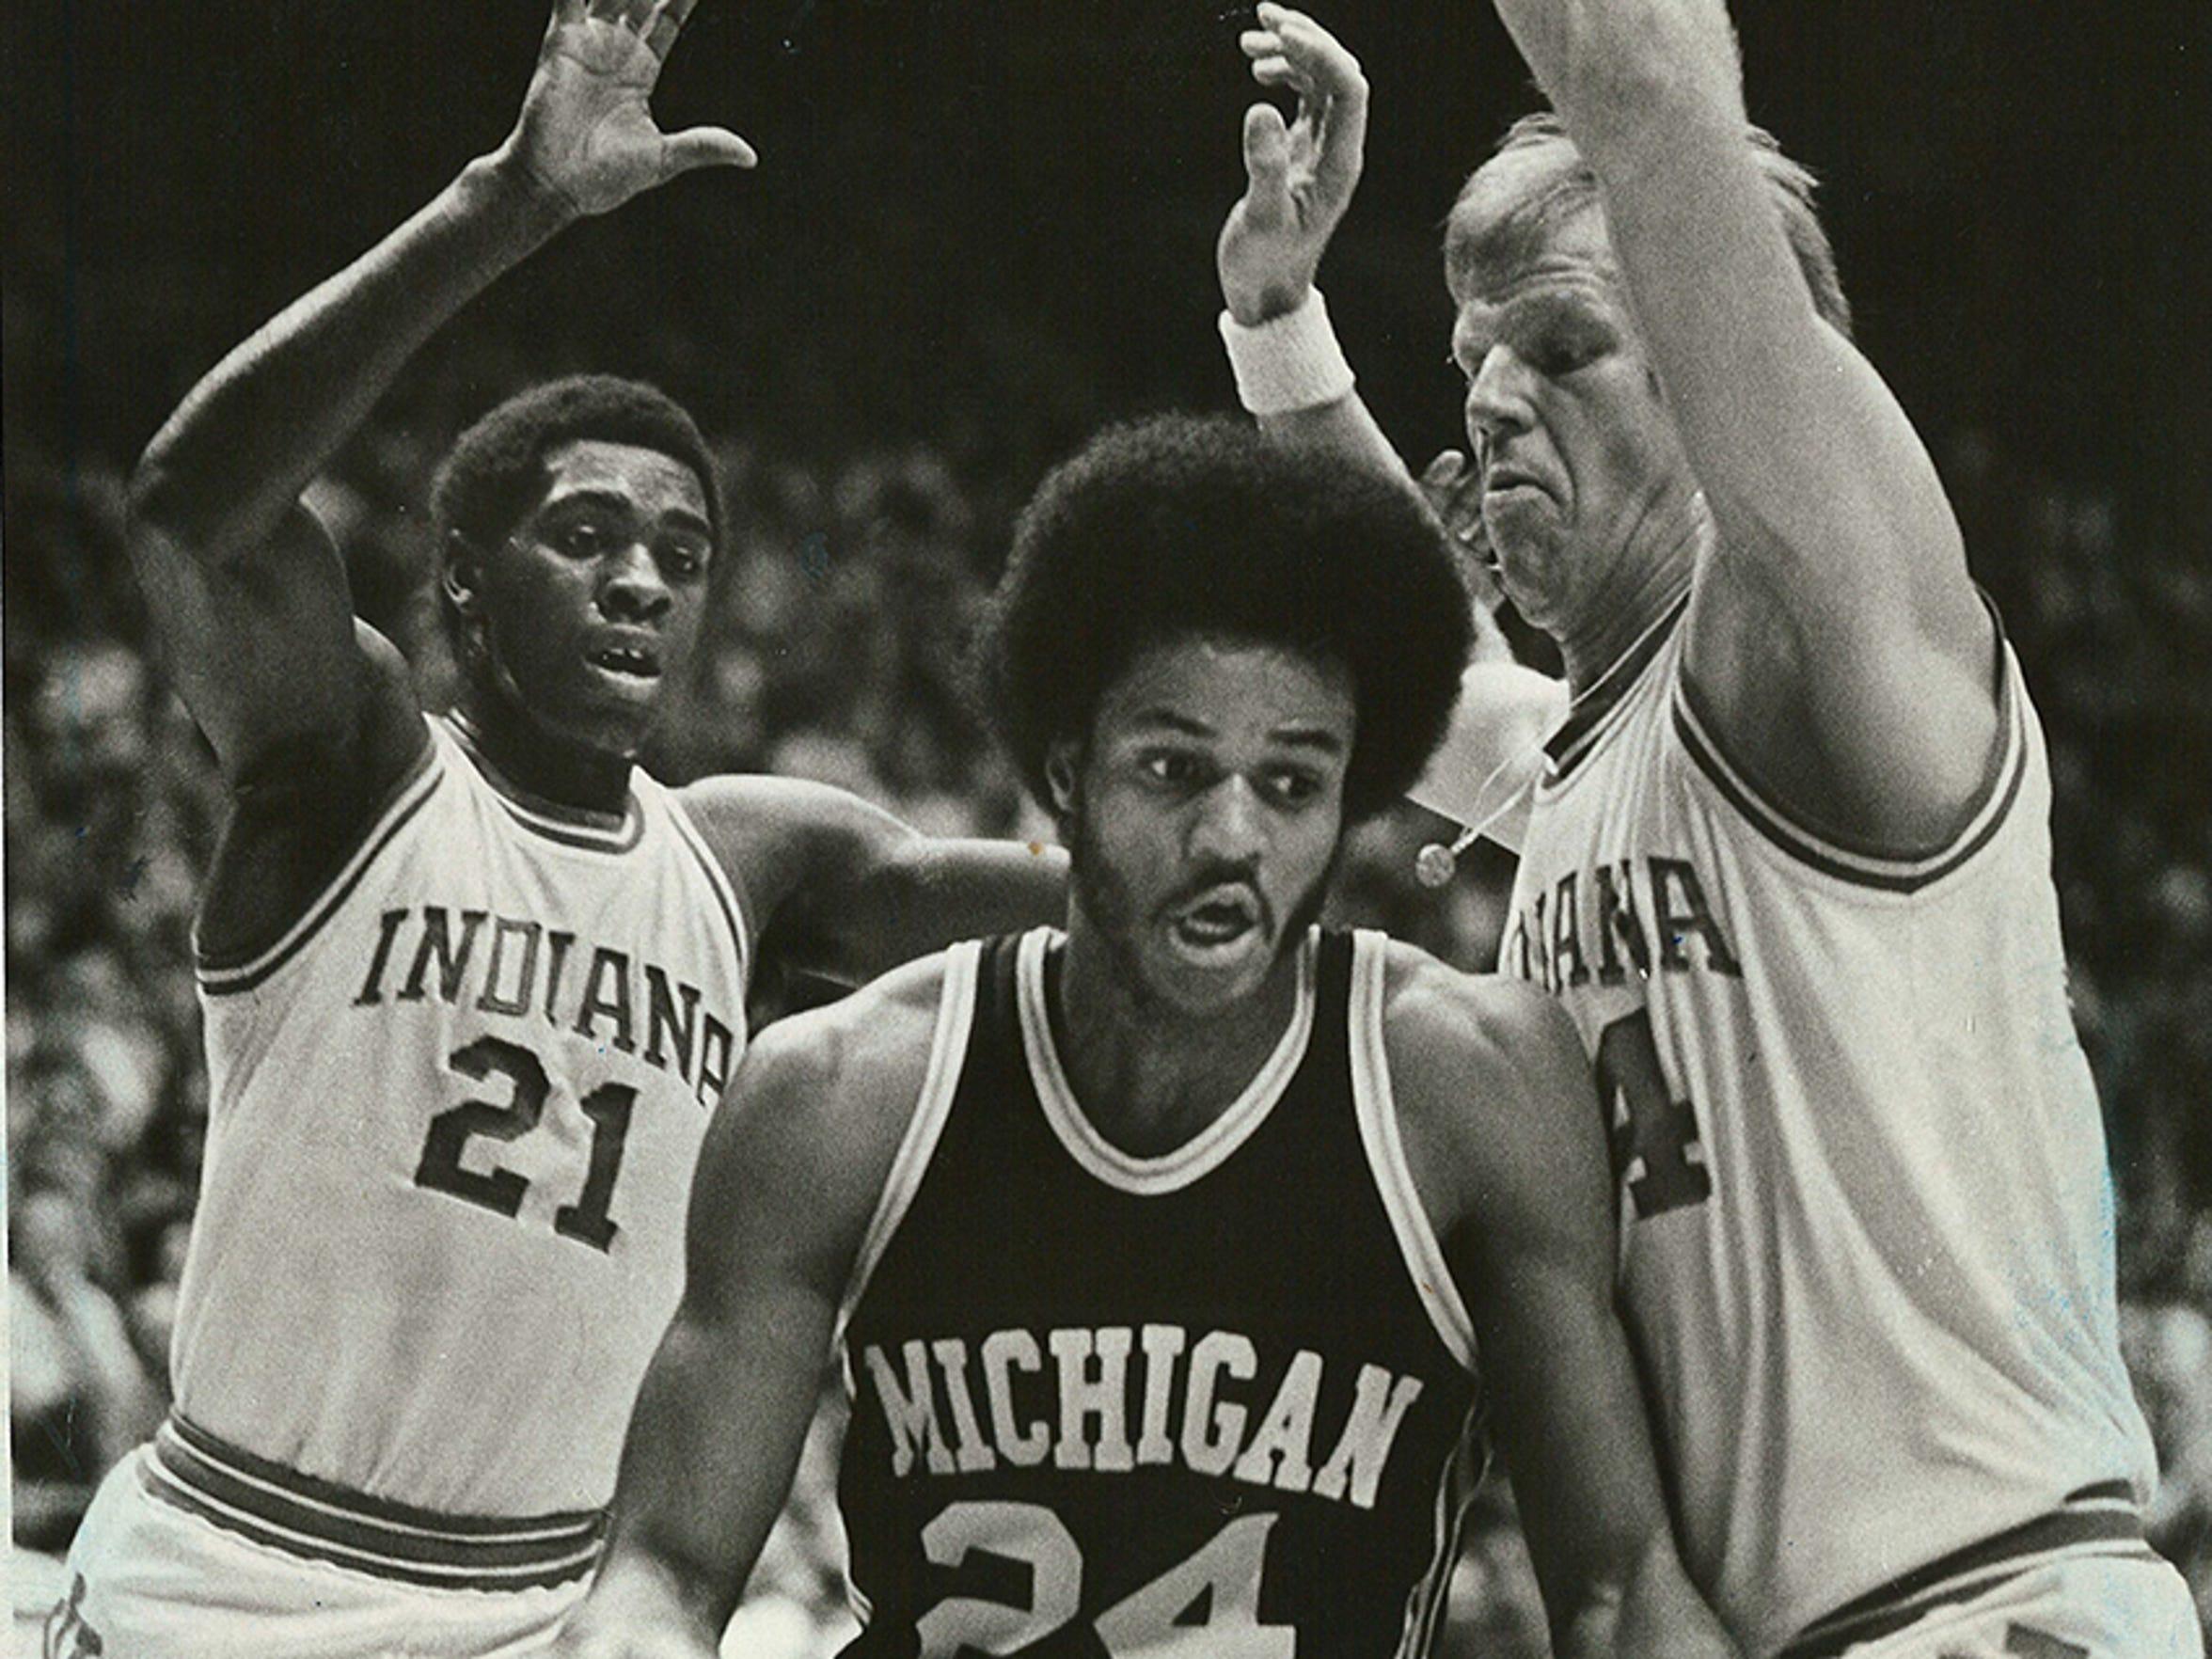 Quinn Buckner and Kent Benson stop Michigan's Rickey Green along the baseline, Feb. 7, 1976.